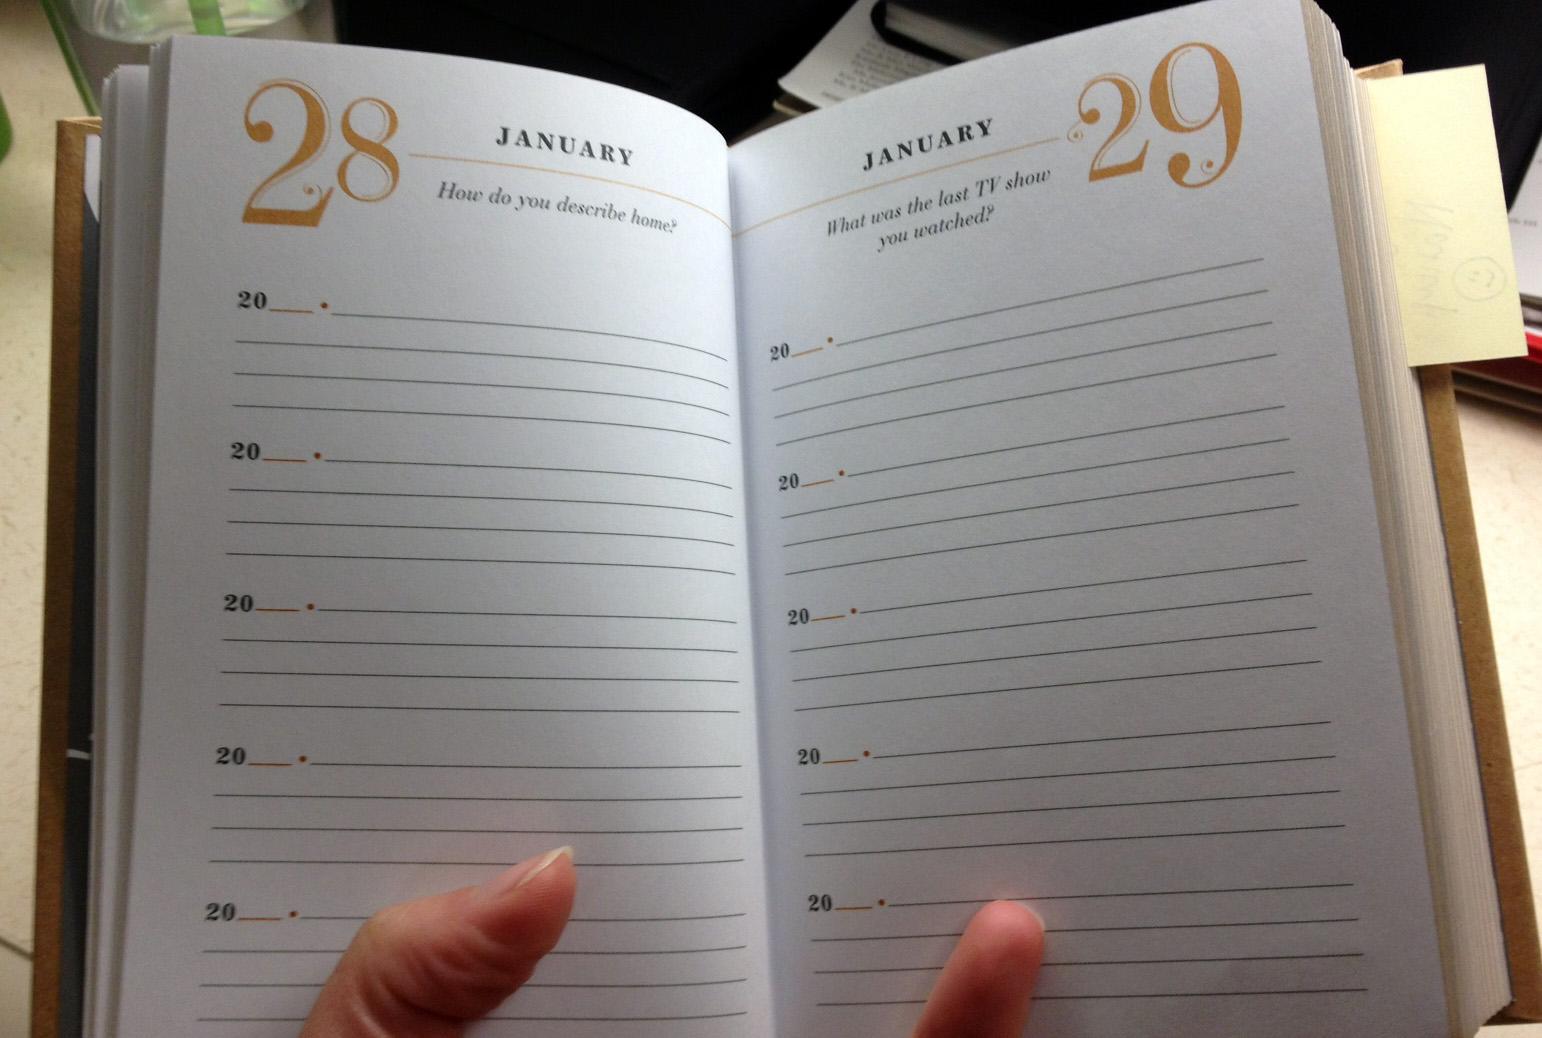 Calendar Year Legal Definition : Calendar year definition insurance search results